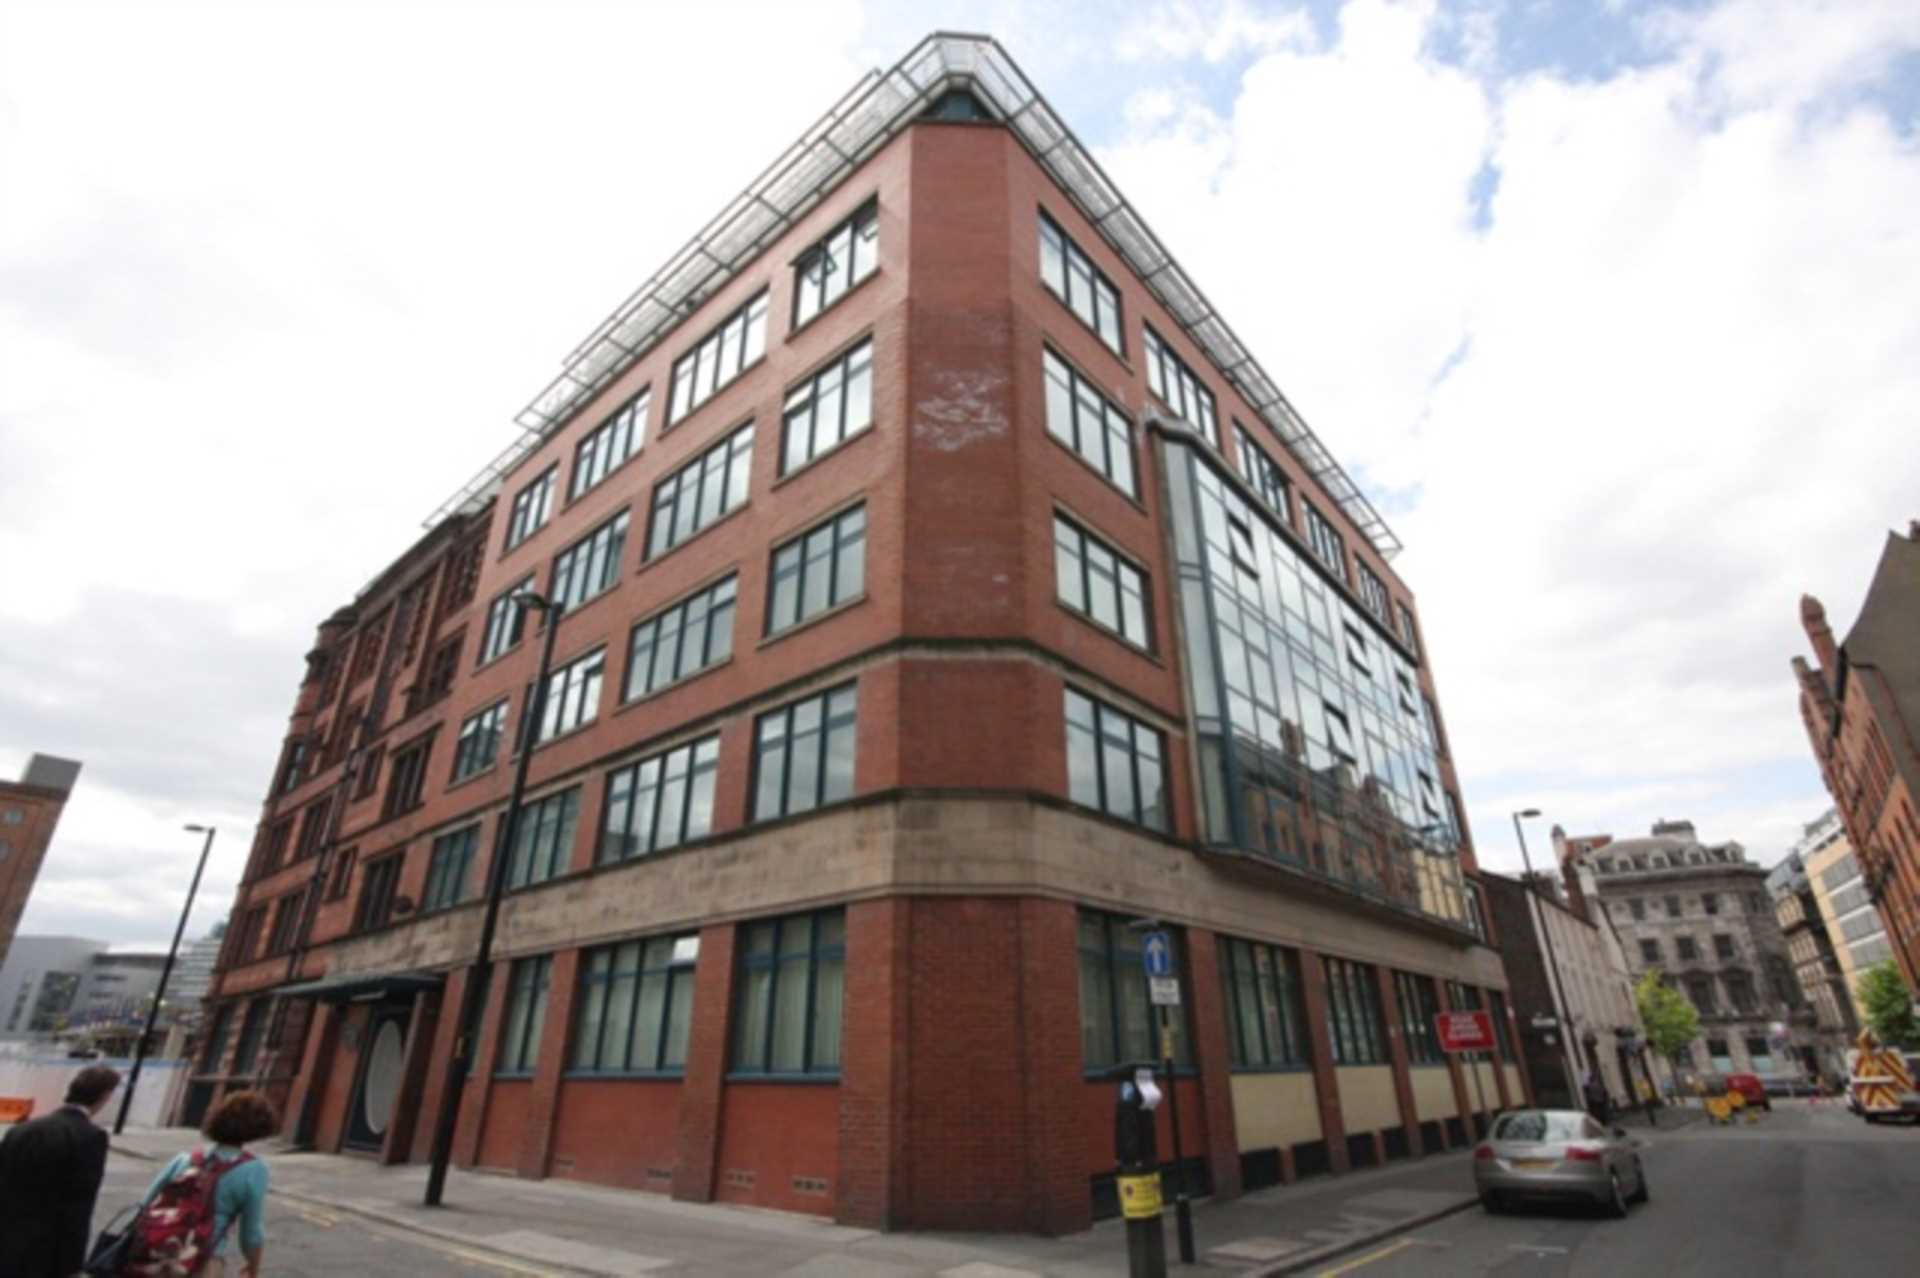 Dale Street, City centre, Image 9